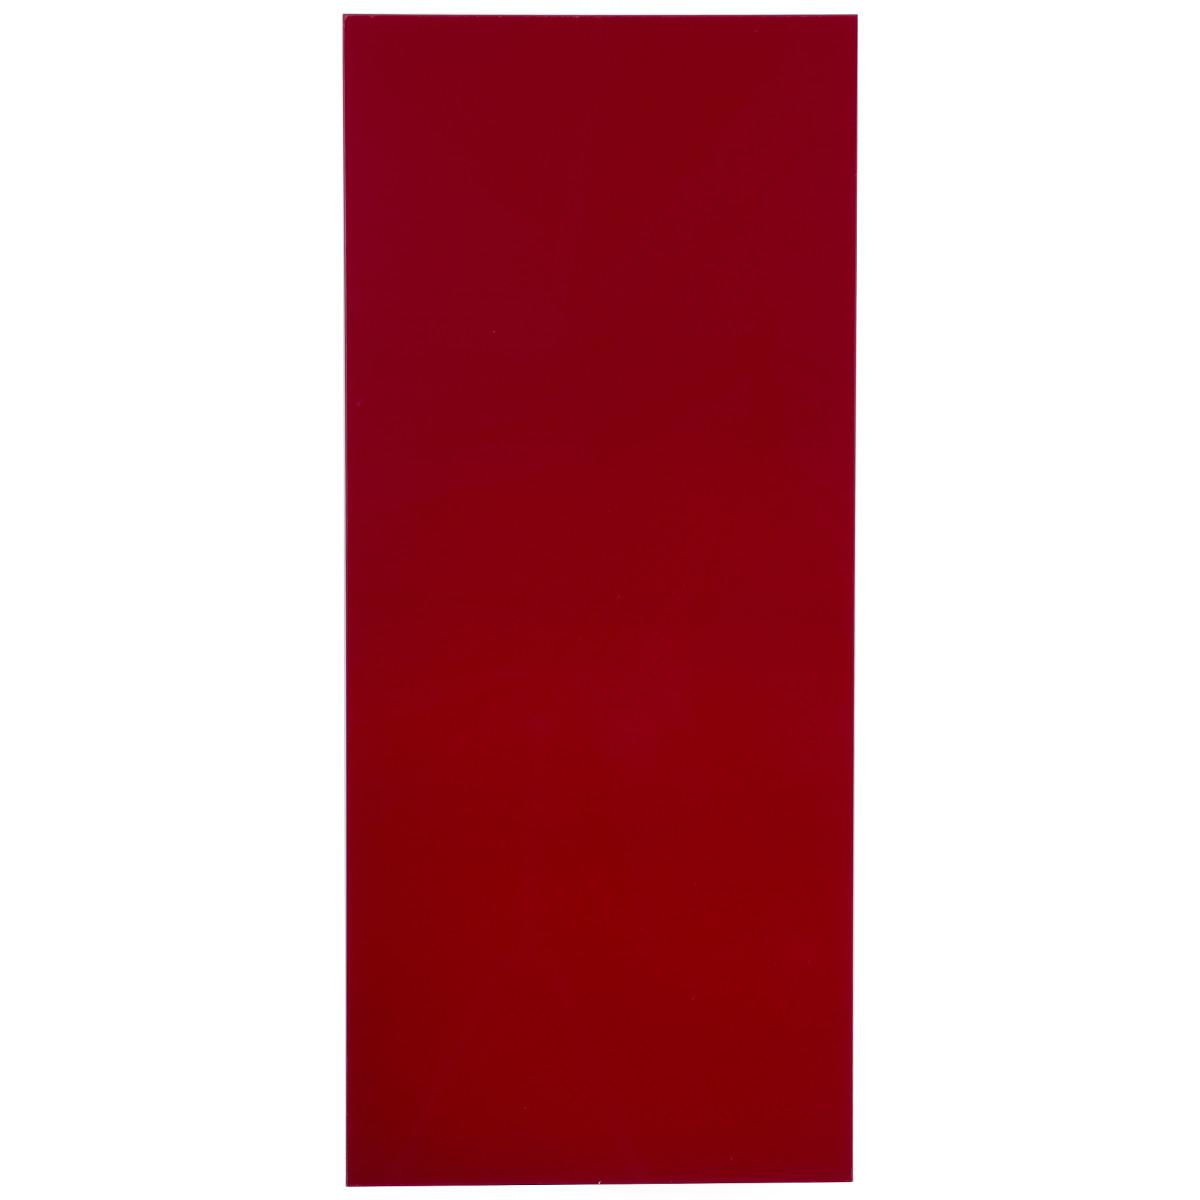 Дверь для шкафа «Бордо» 40х92 см ЛМДФ/пластик цвет бордо